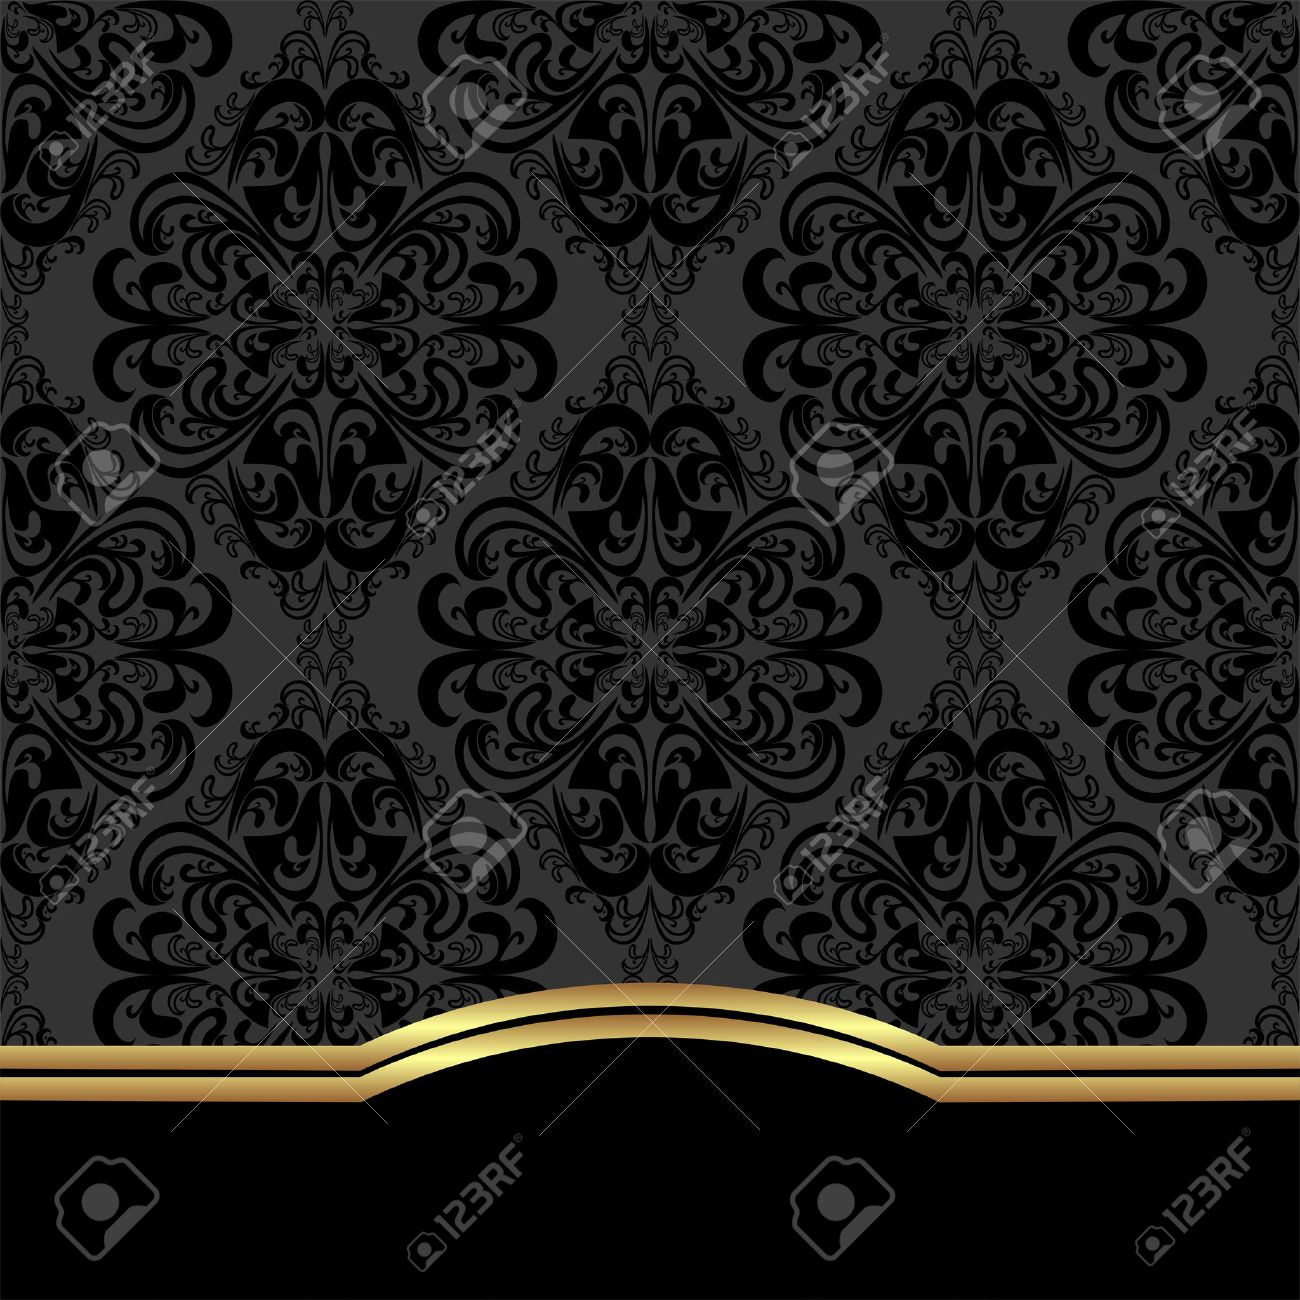 Elegant ornate Background with border for design. - 41198378